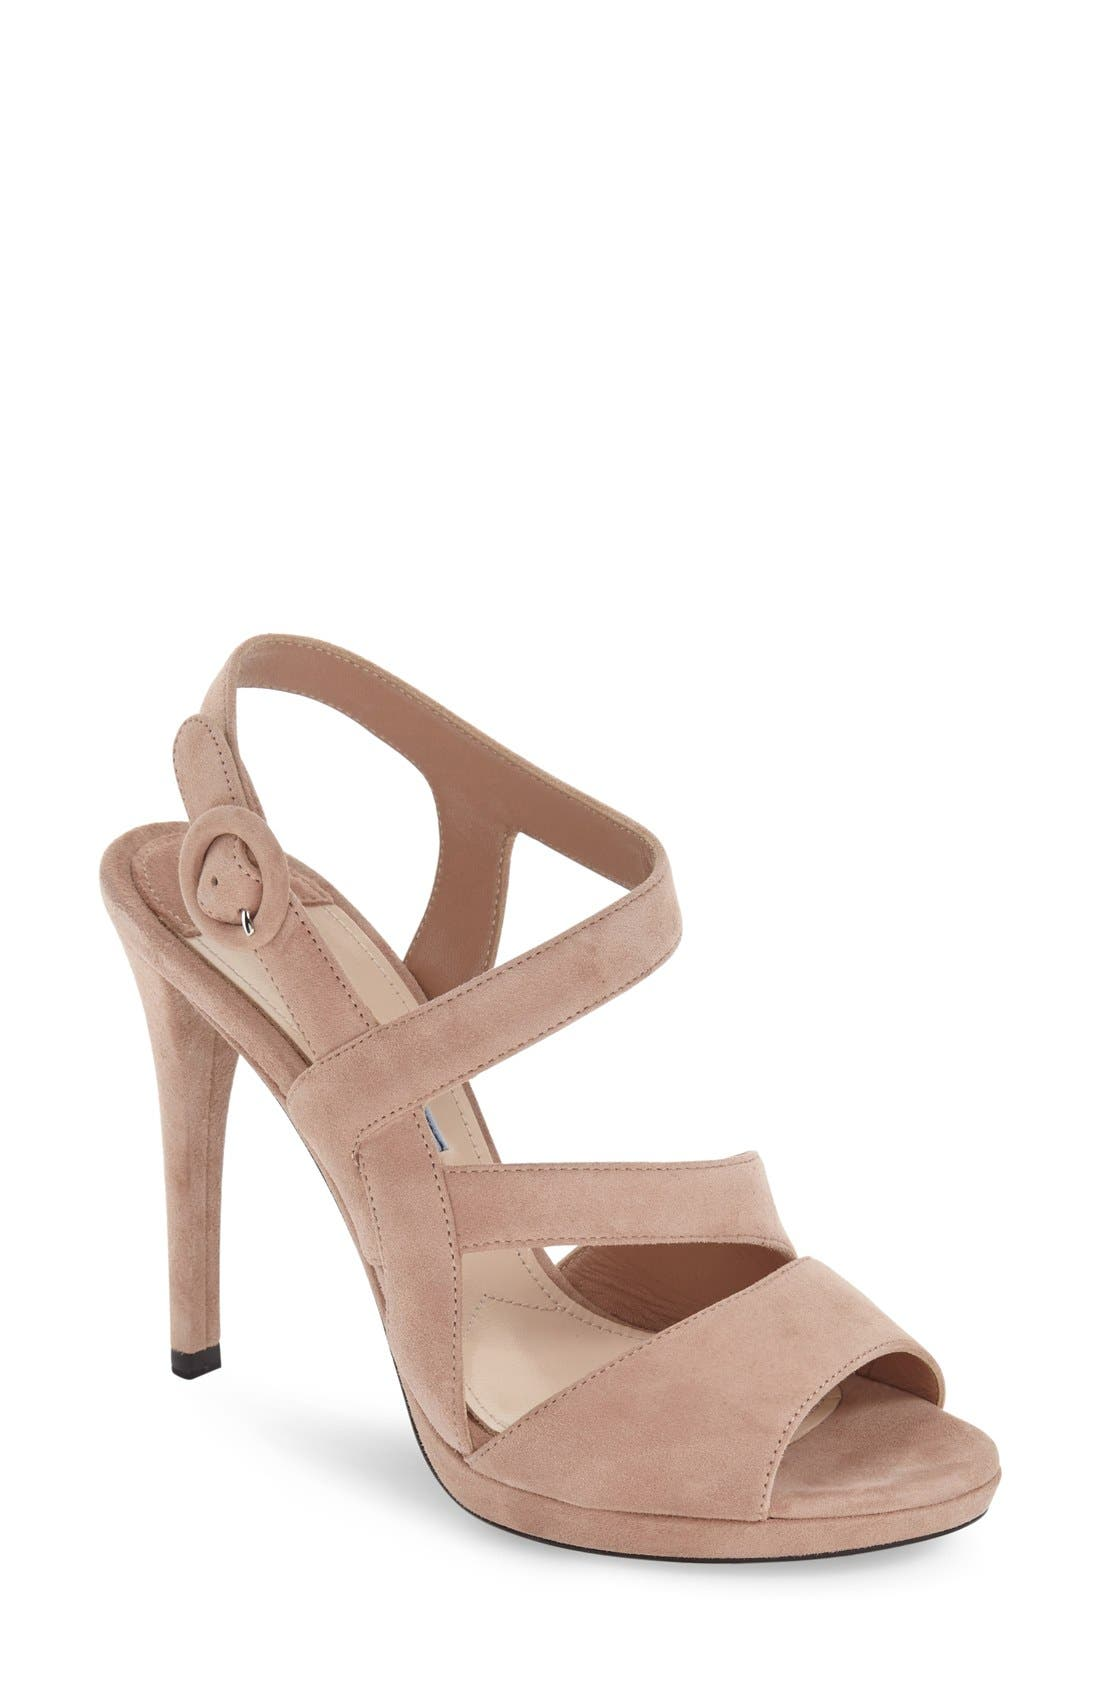 Main Image - Prada Strappy Sandal (Women)